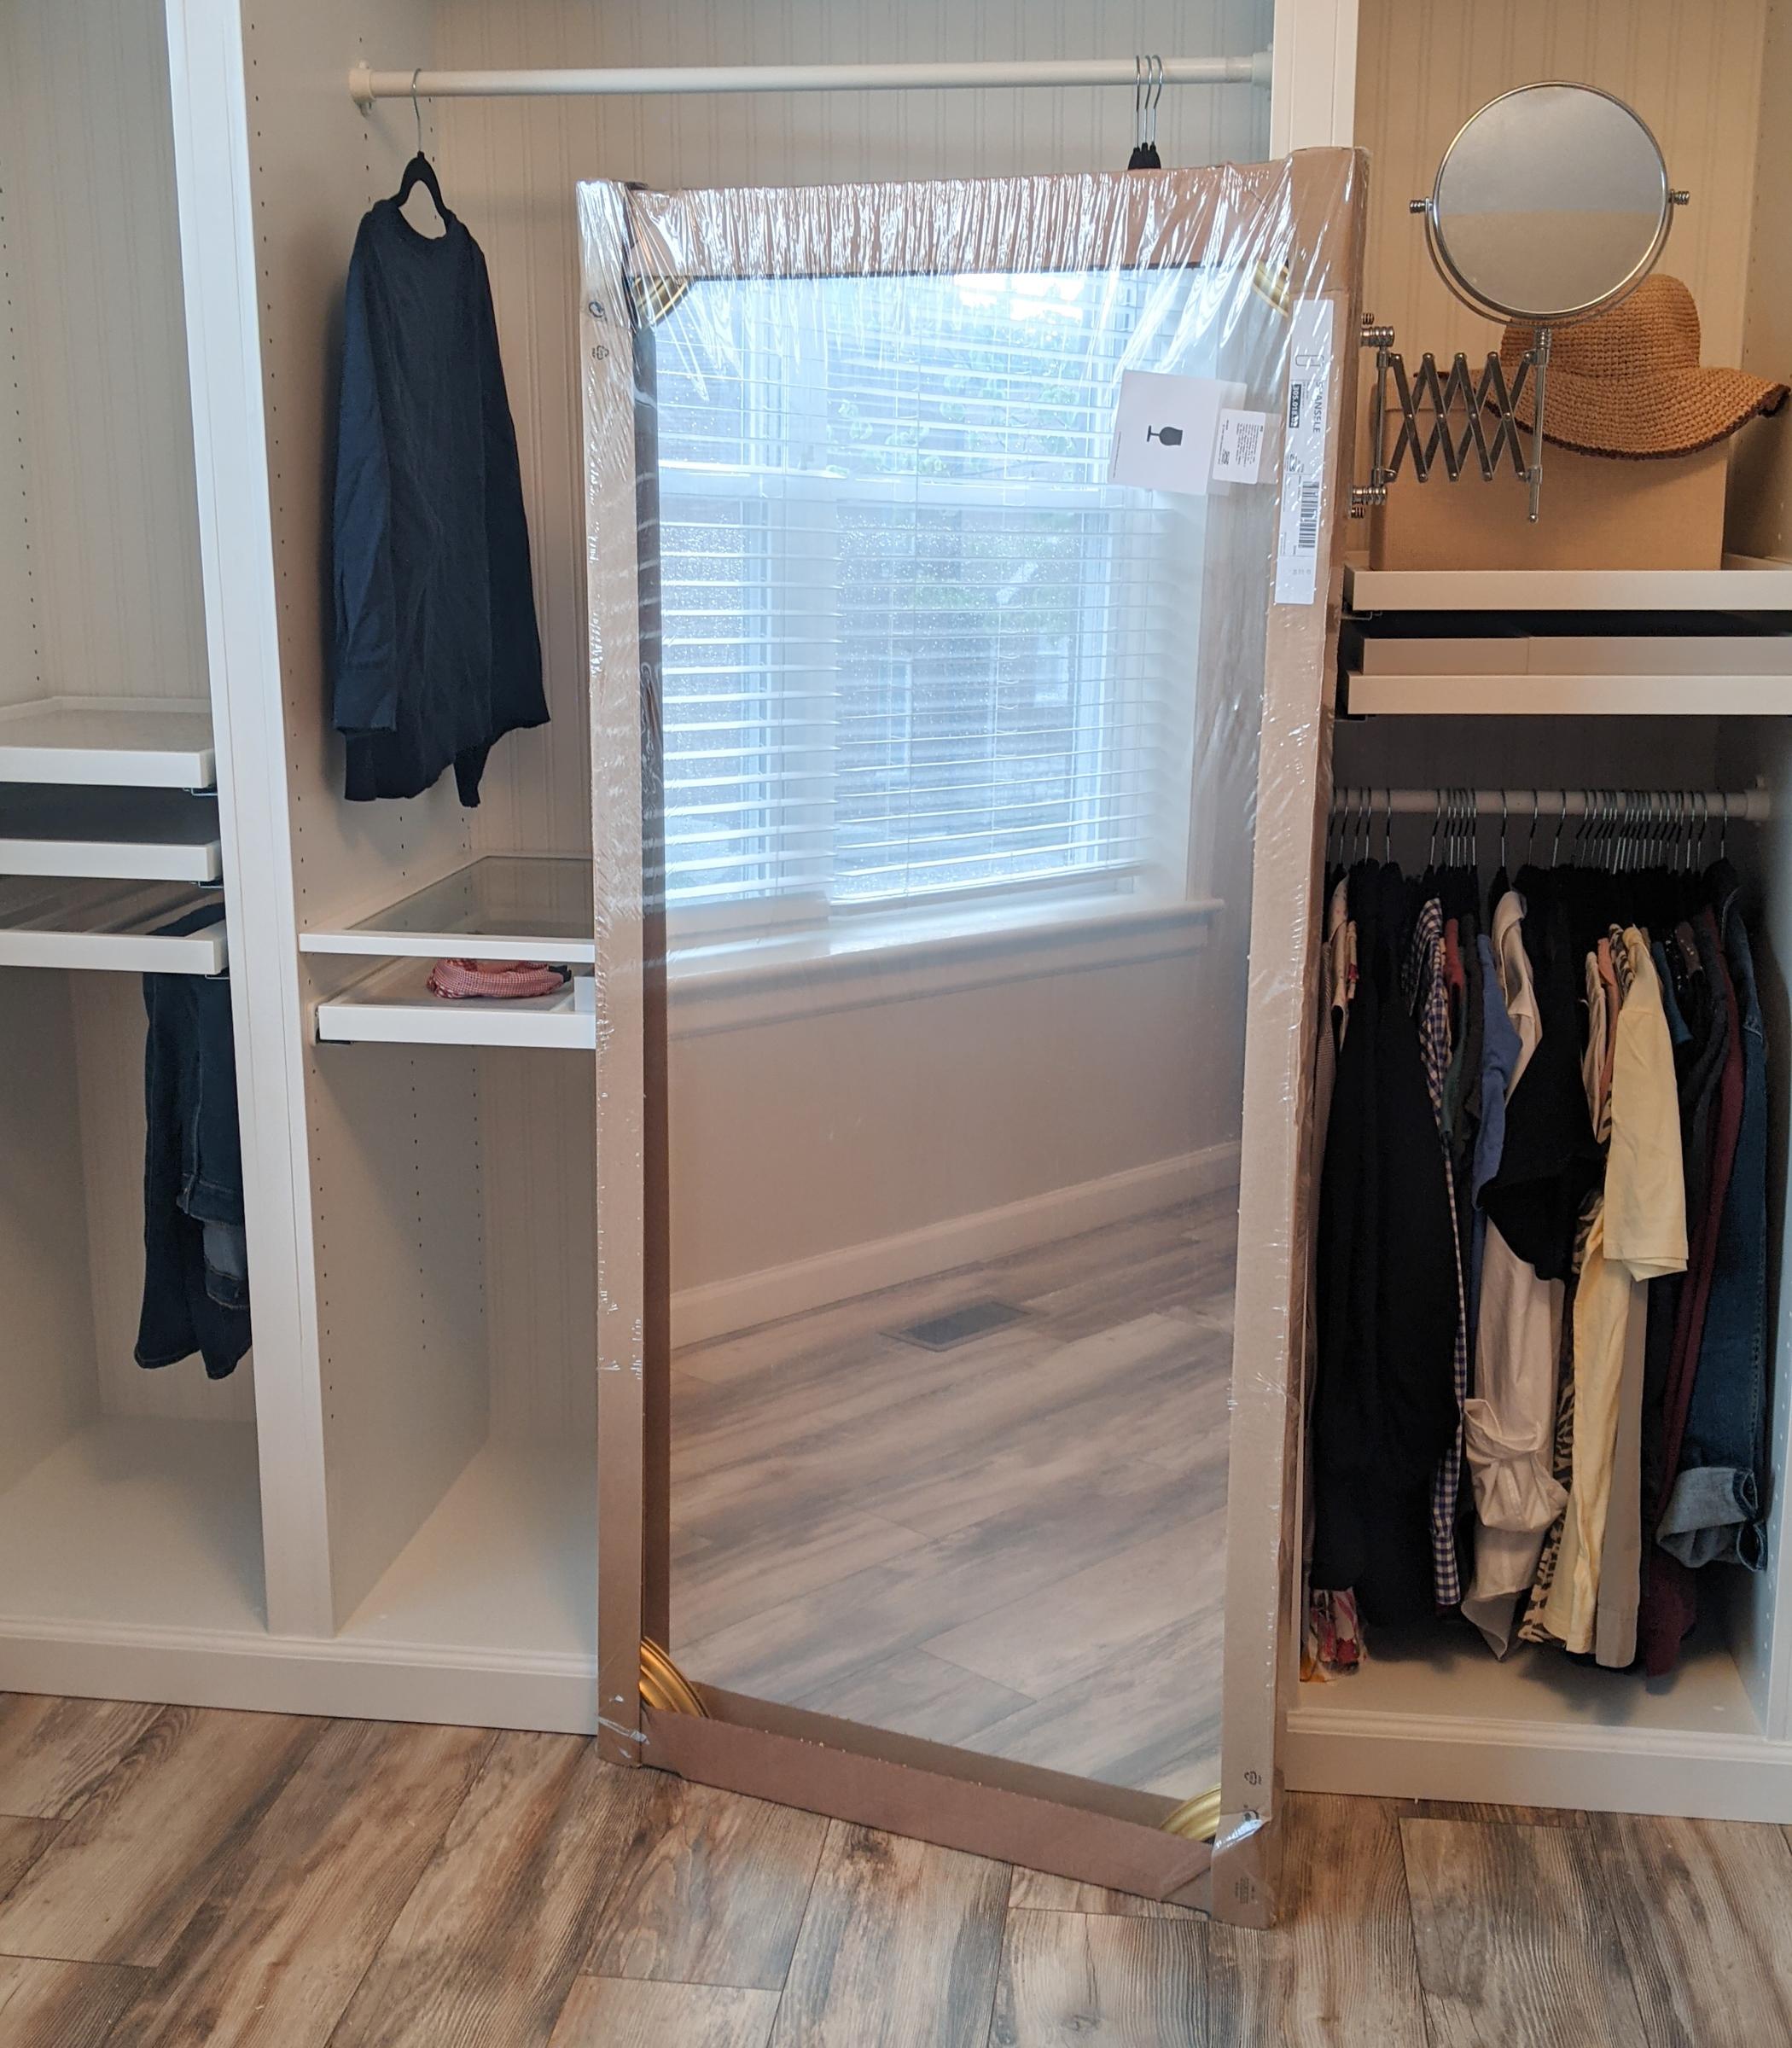 Ikea Svansele mirror before un boxing